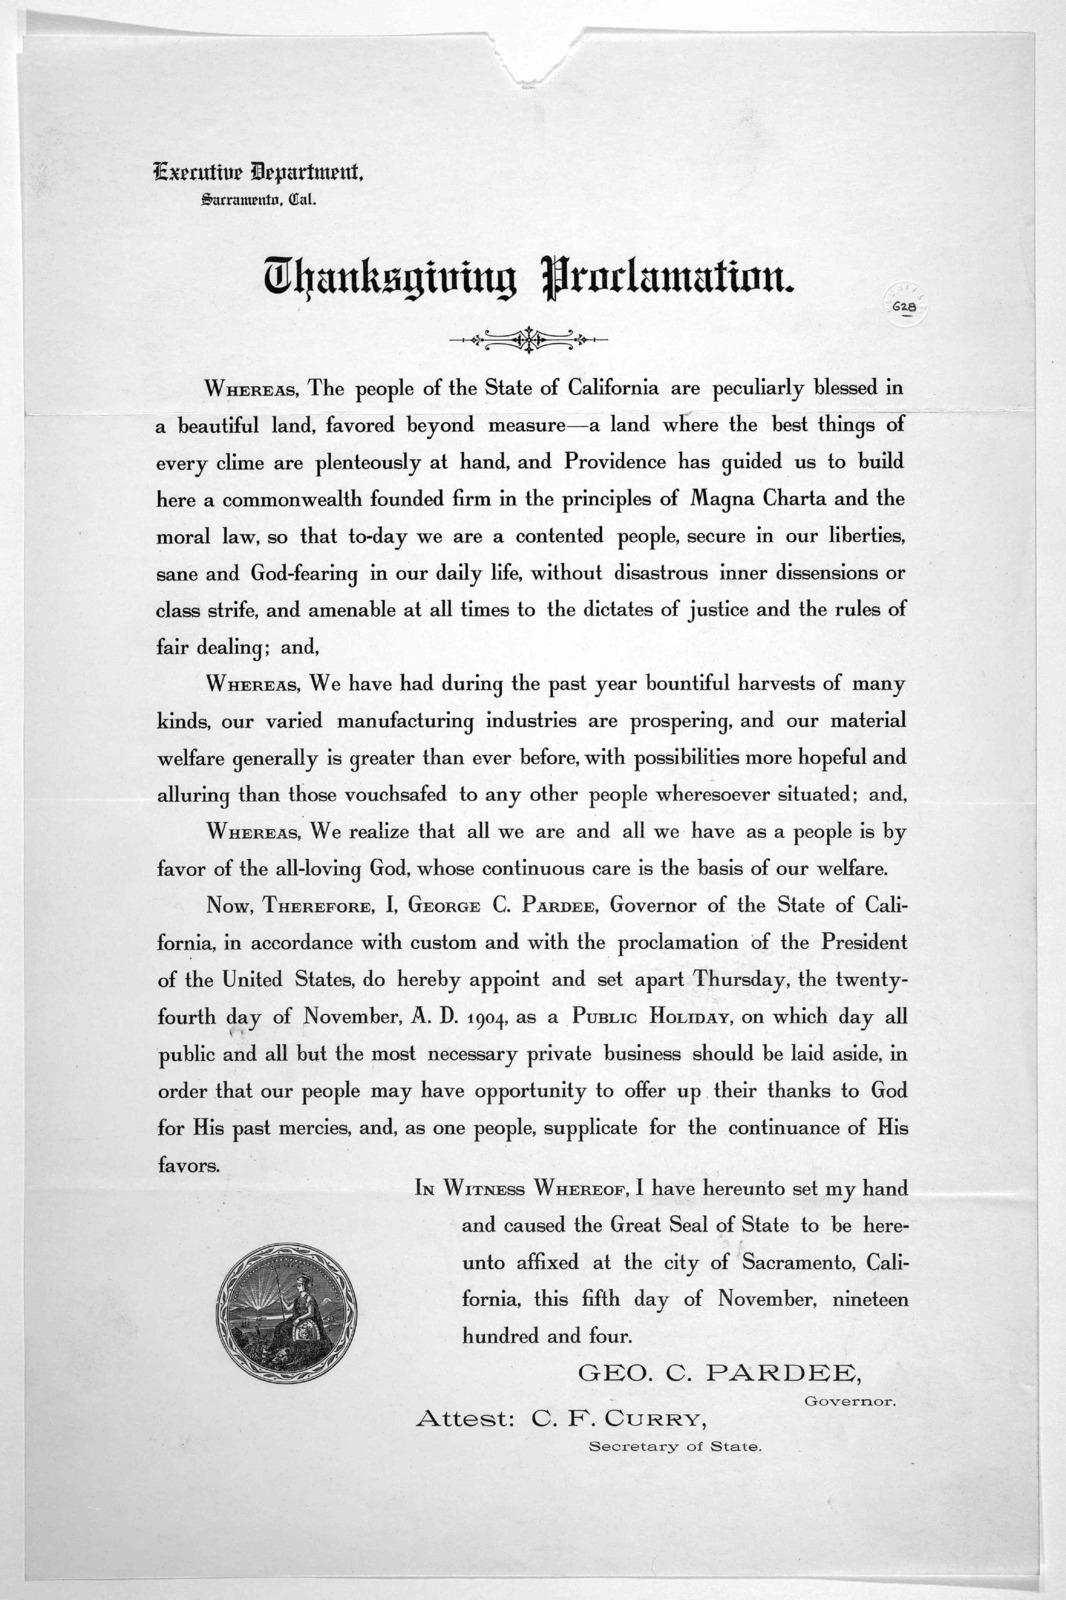 Thanksgiving proclamation. November 5th 1904.